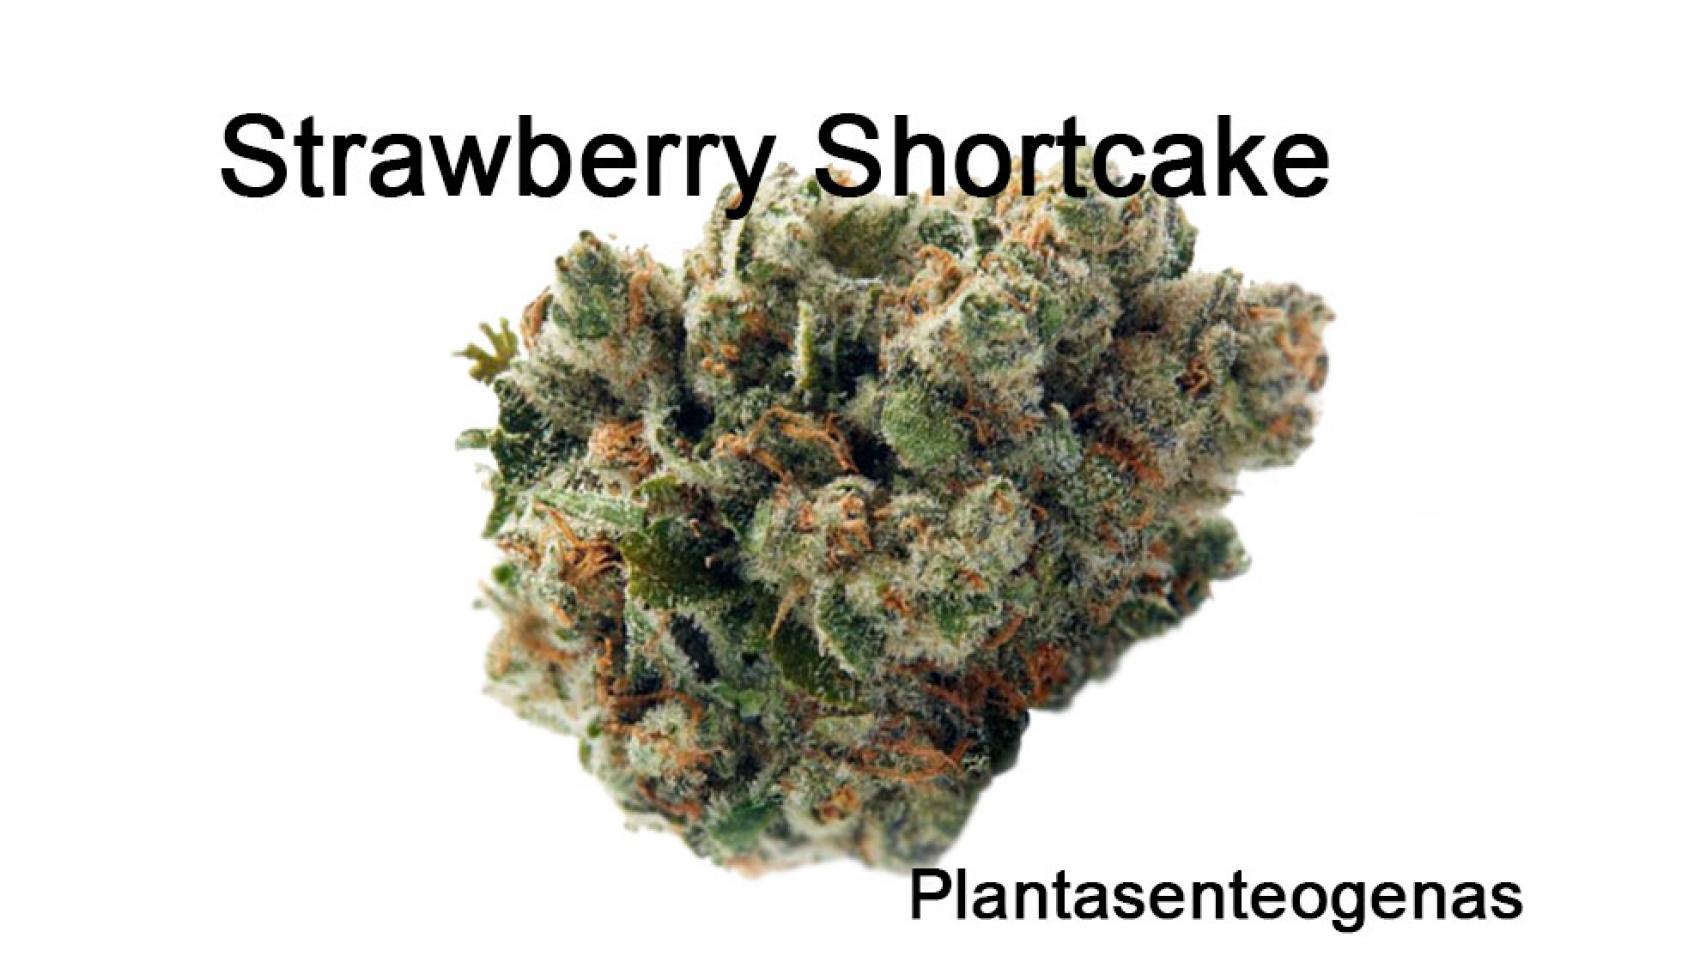 strawberry-shortcake-p-1